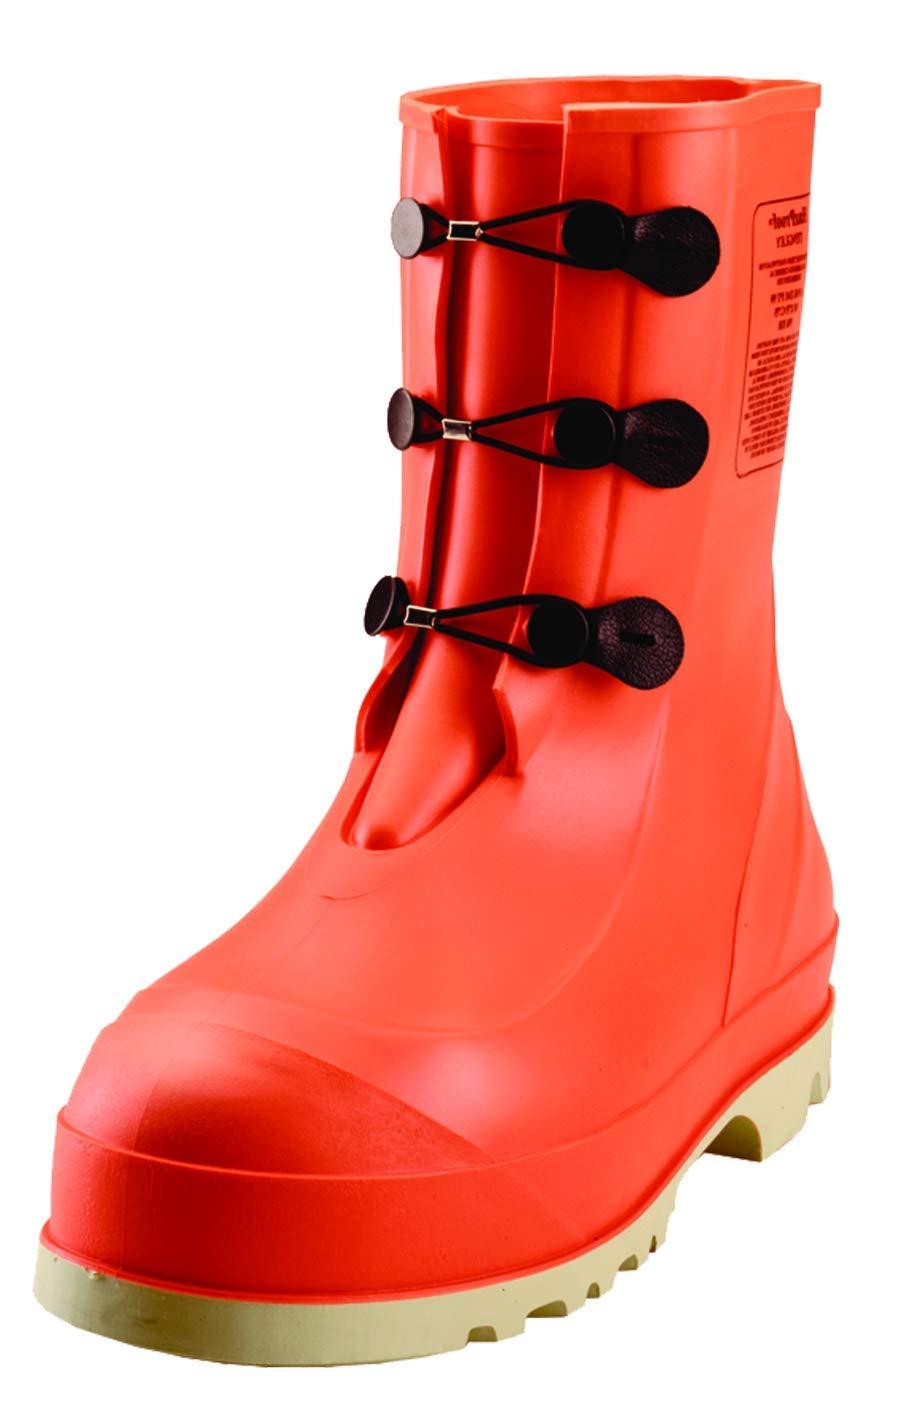 HAZPROOF BOOTS 82330-13 by HAZPROOF